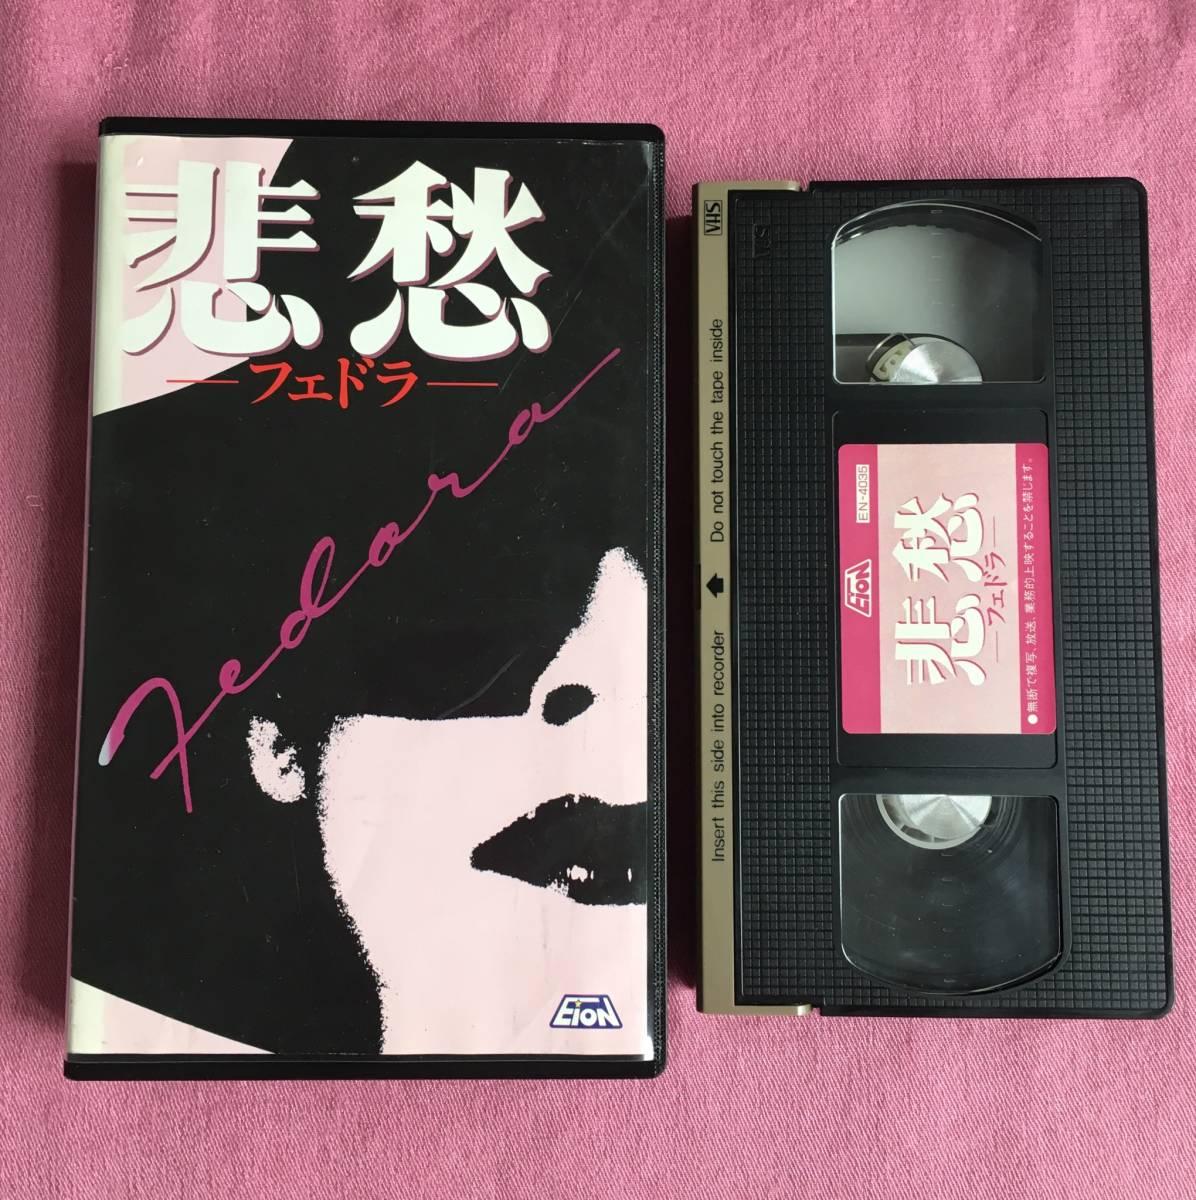 VHS ビデオ 悲愁 フェドラ Fedora 95分 カラー 日本語 字幕 スーパー 映画 洋画 1979年 ビリー ワイルダー の悲愁_画像1